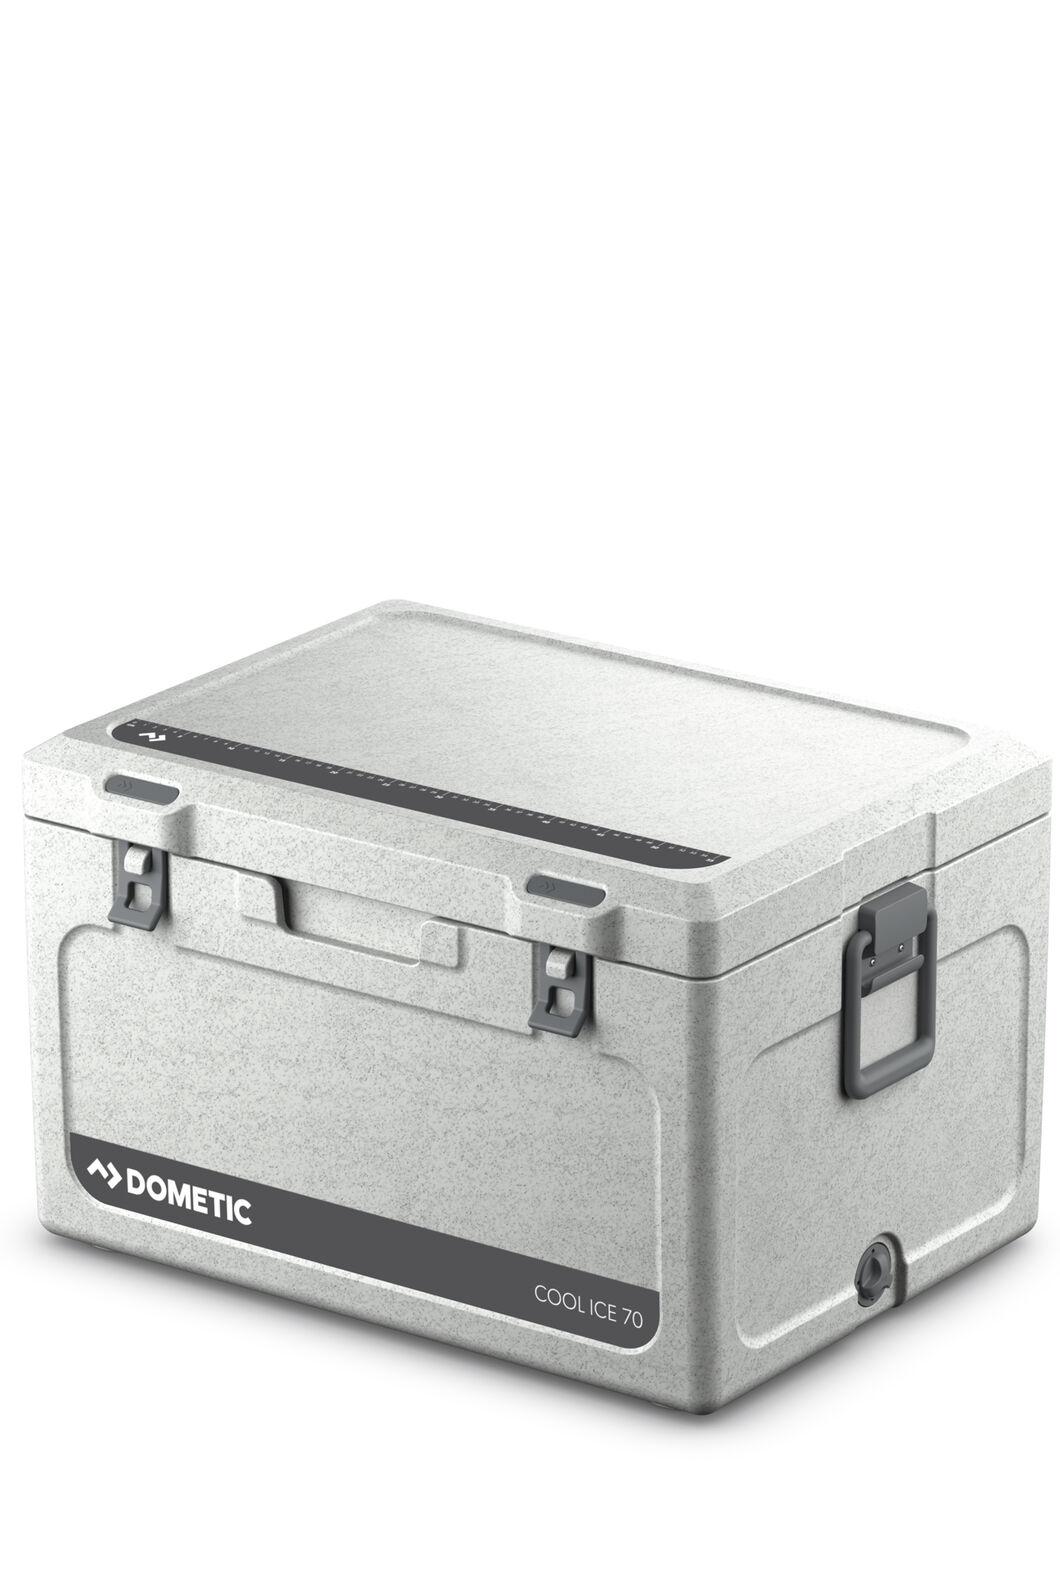 Dometic Cool Ice CI70 Icebox 71L, None, hi-res